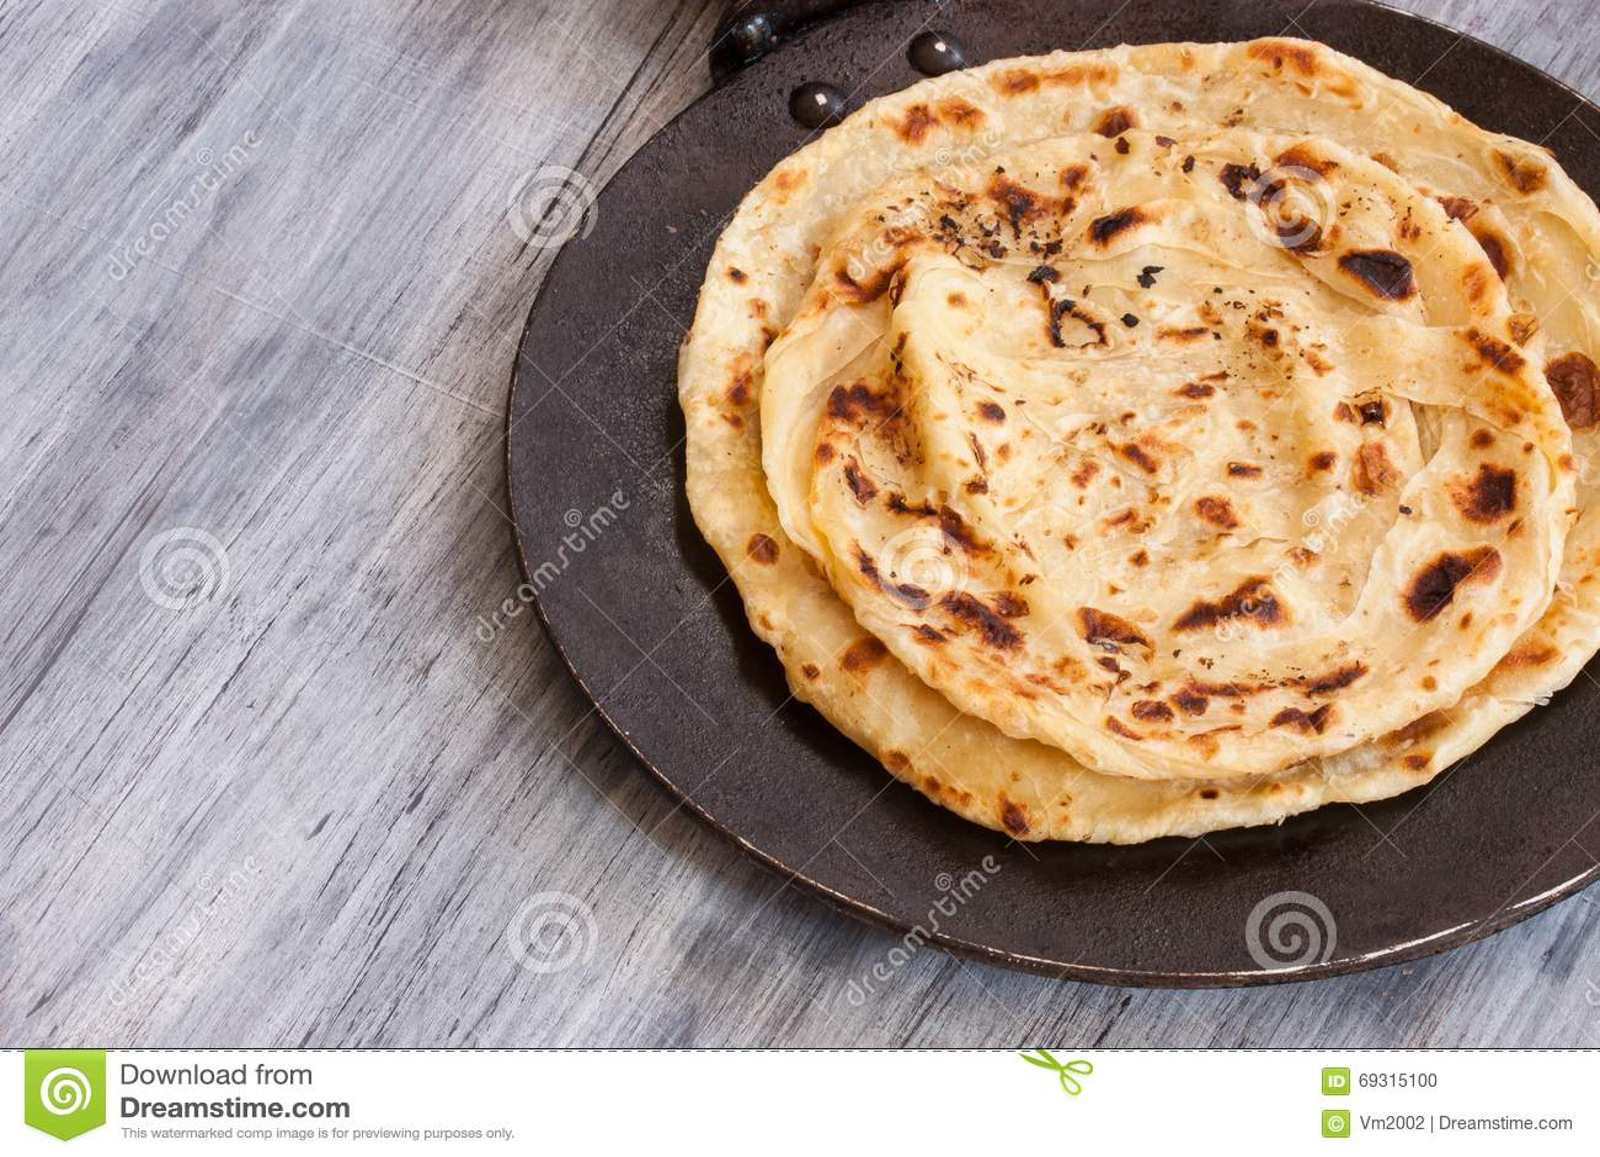 Indianina Paratha mieszkania płatowaty chleb